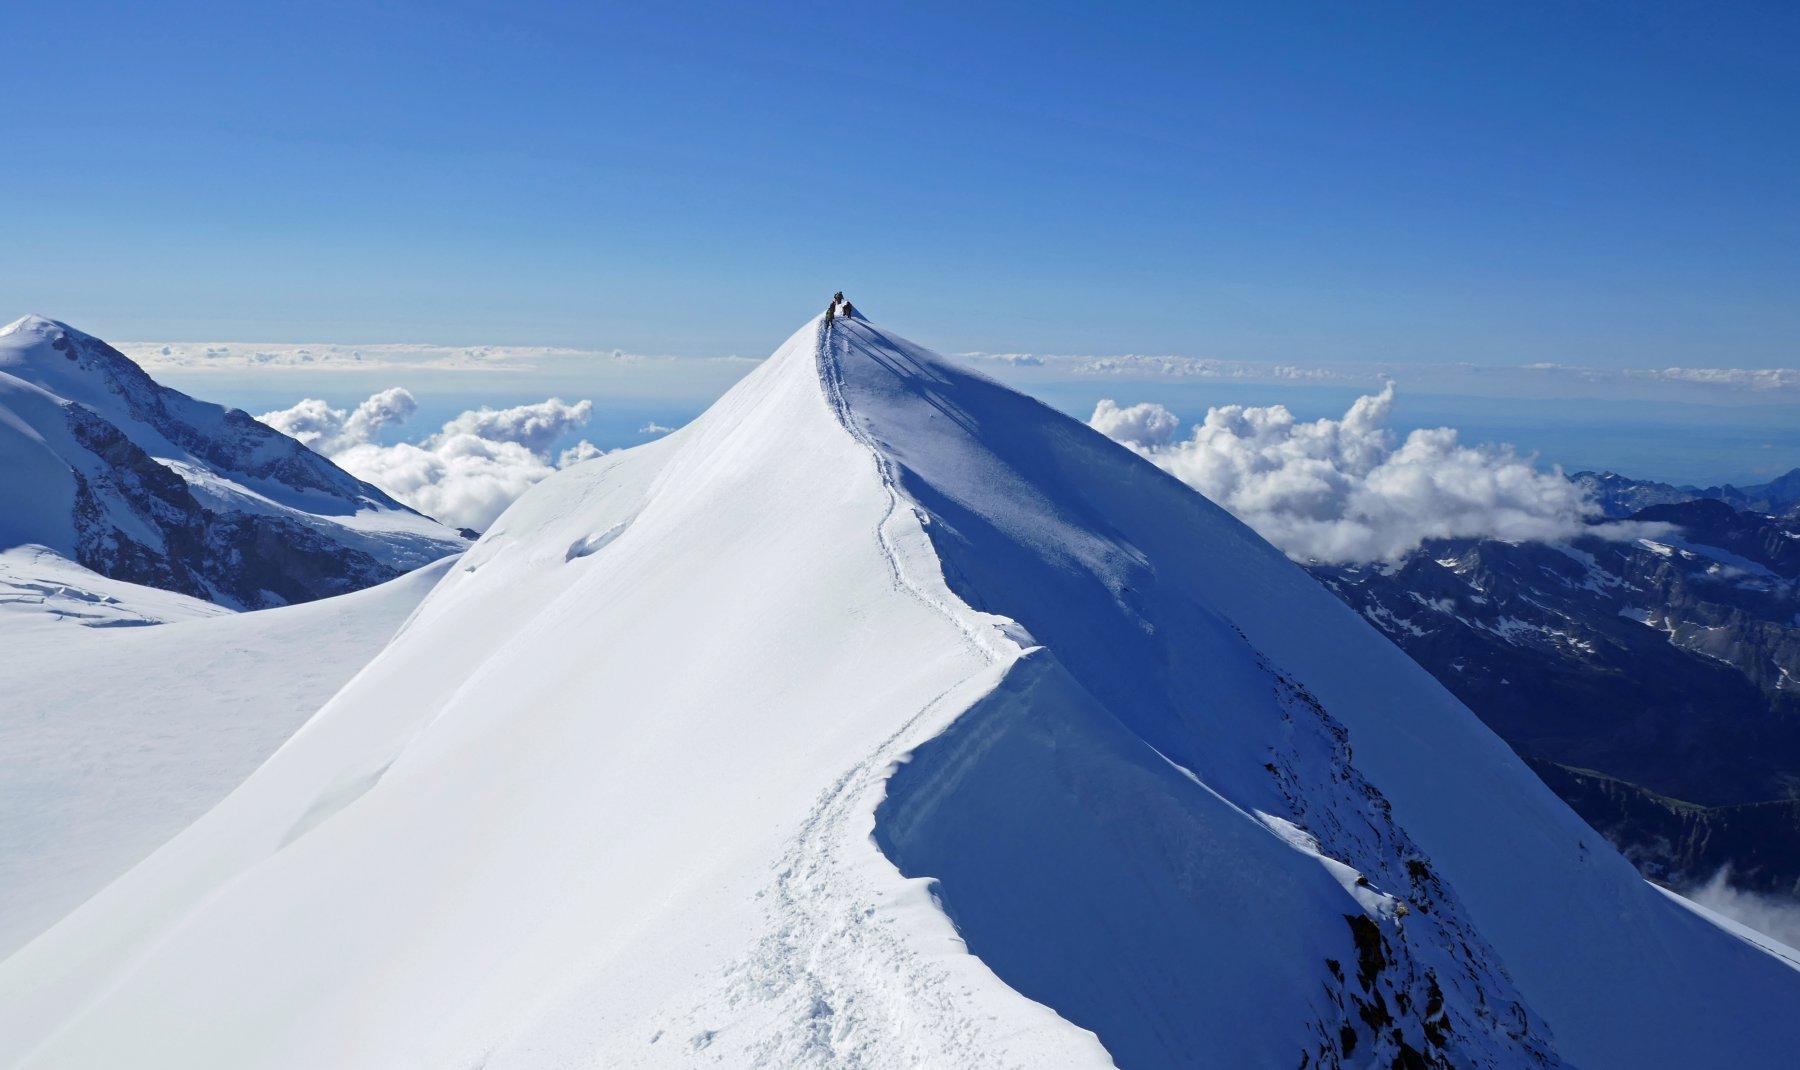 Cordate in discesa lungo l' esile cresta nevosa